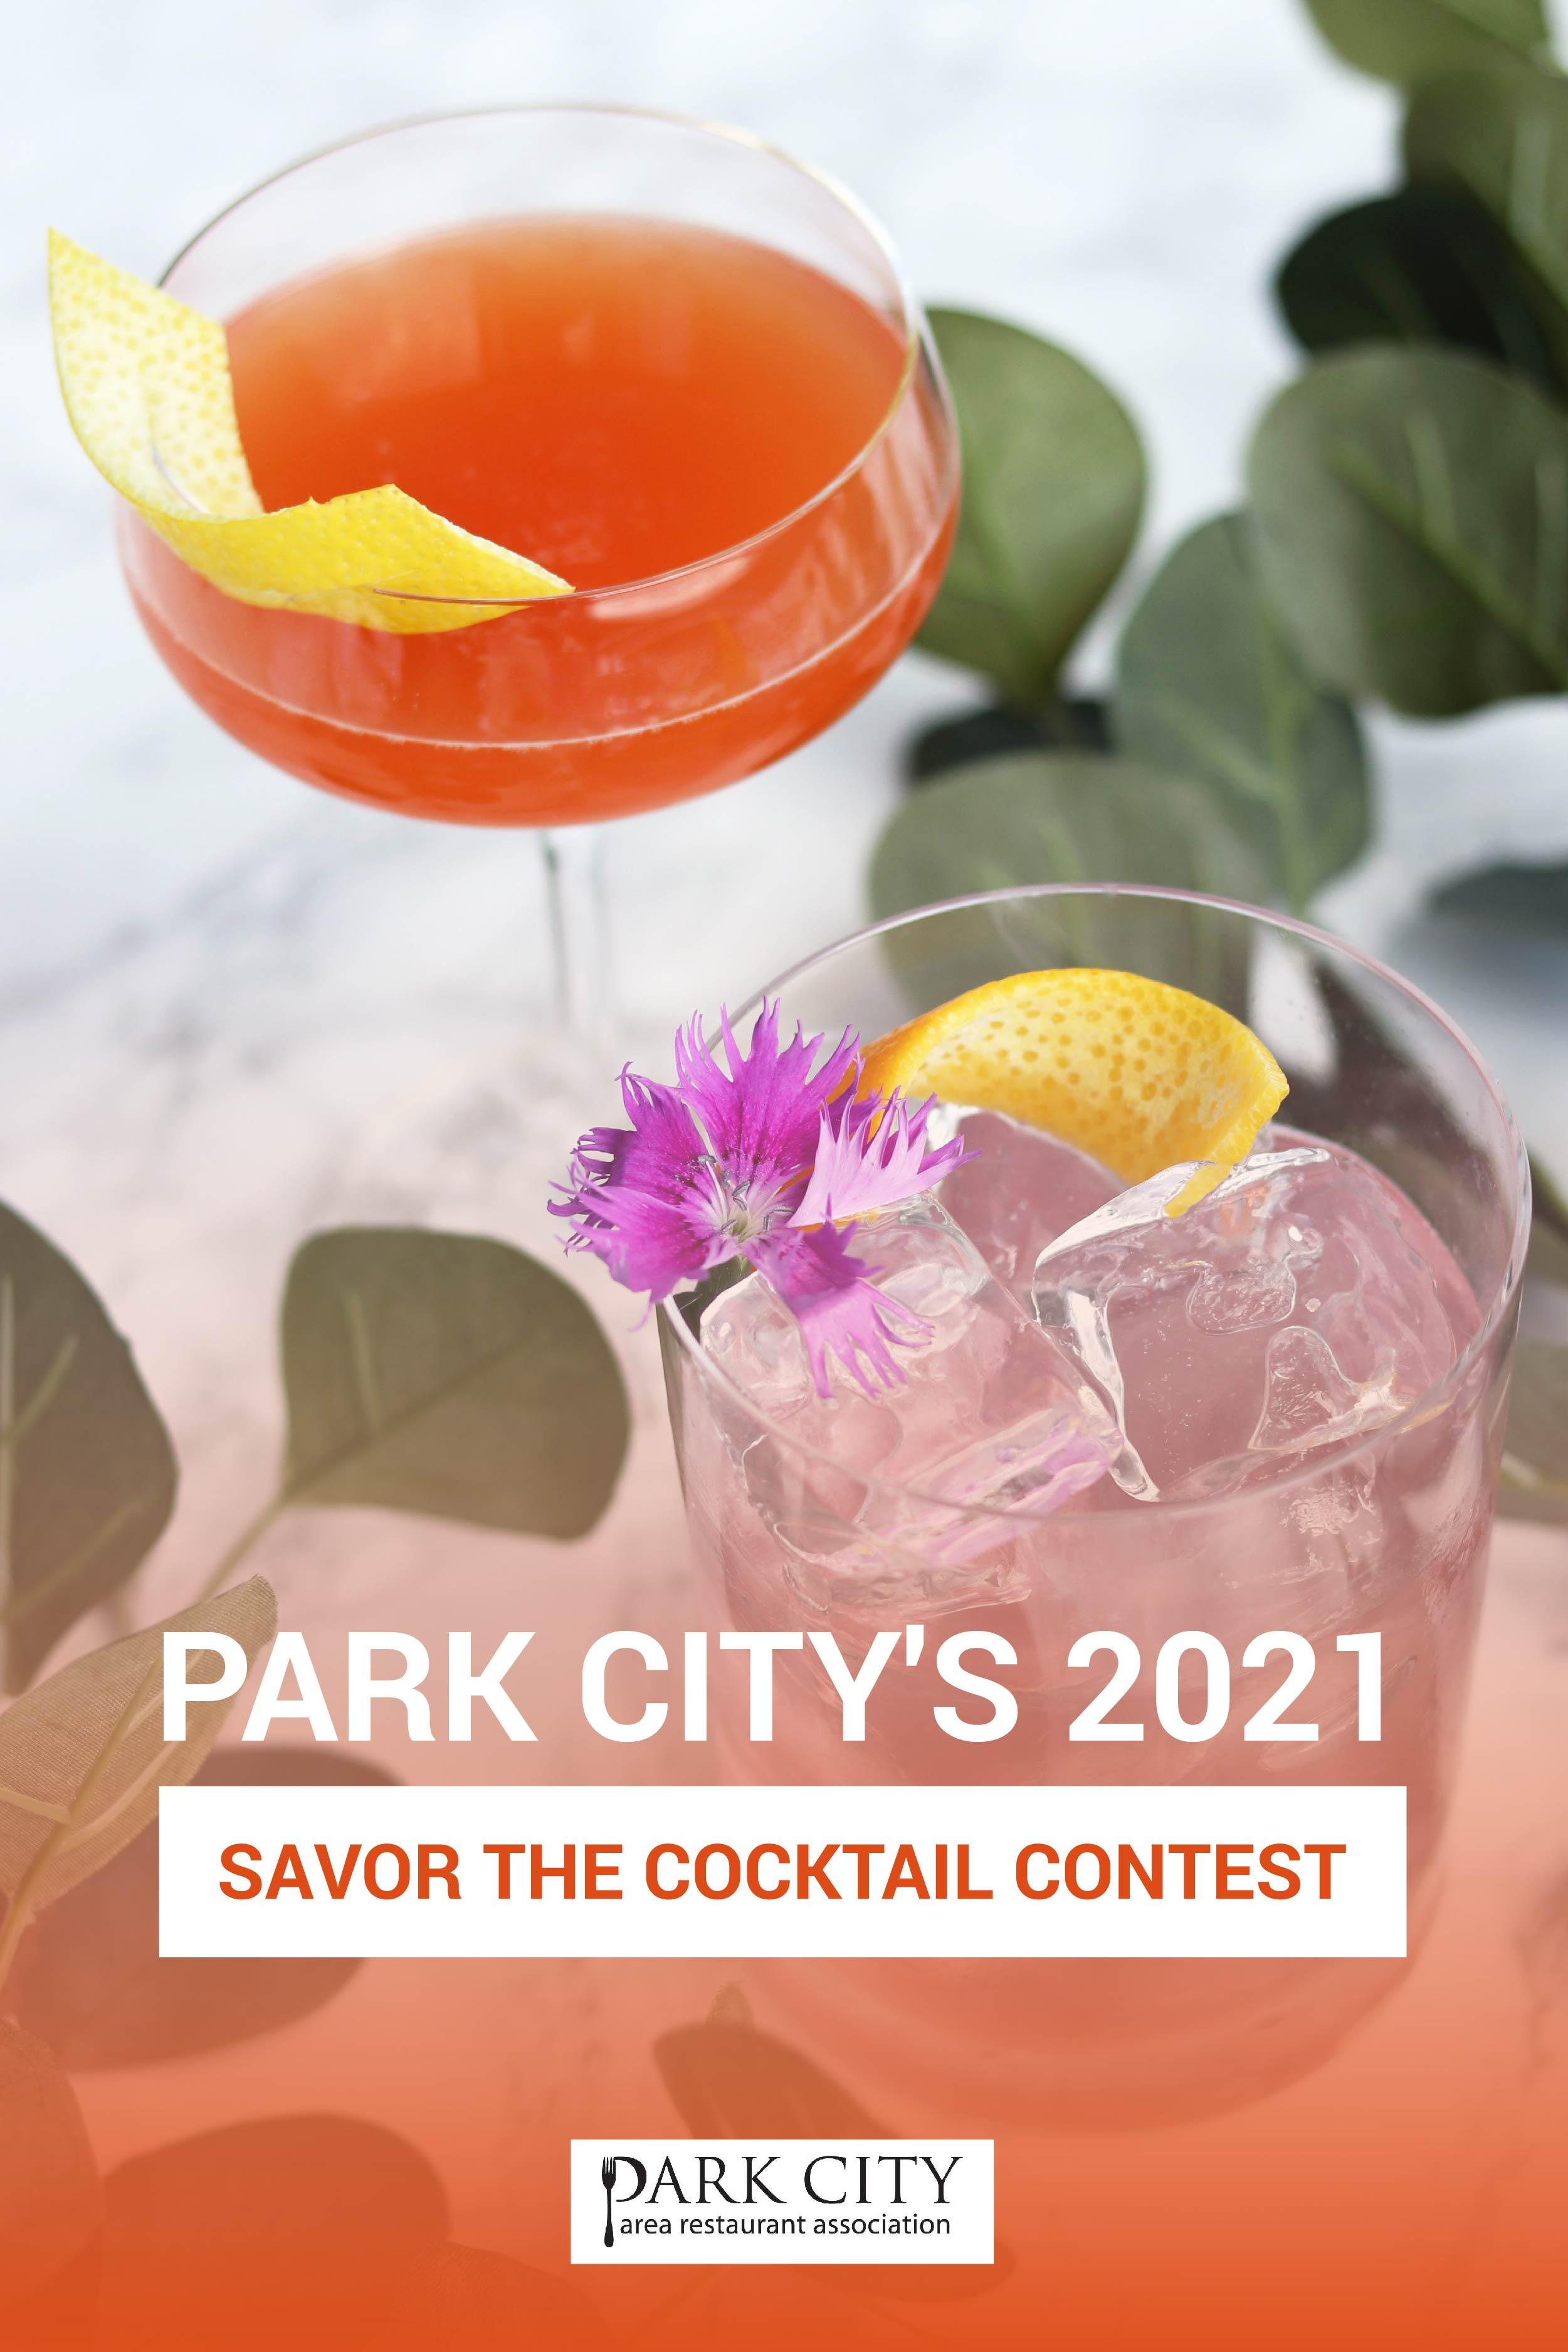 Park City's Summer Cocktail Contest 2021